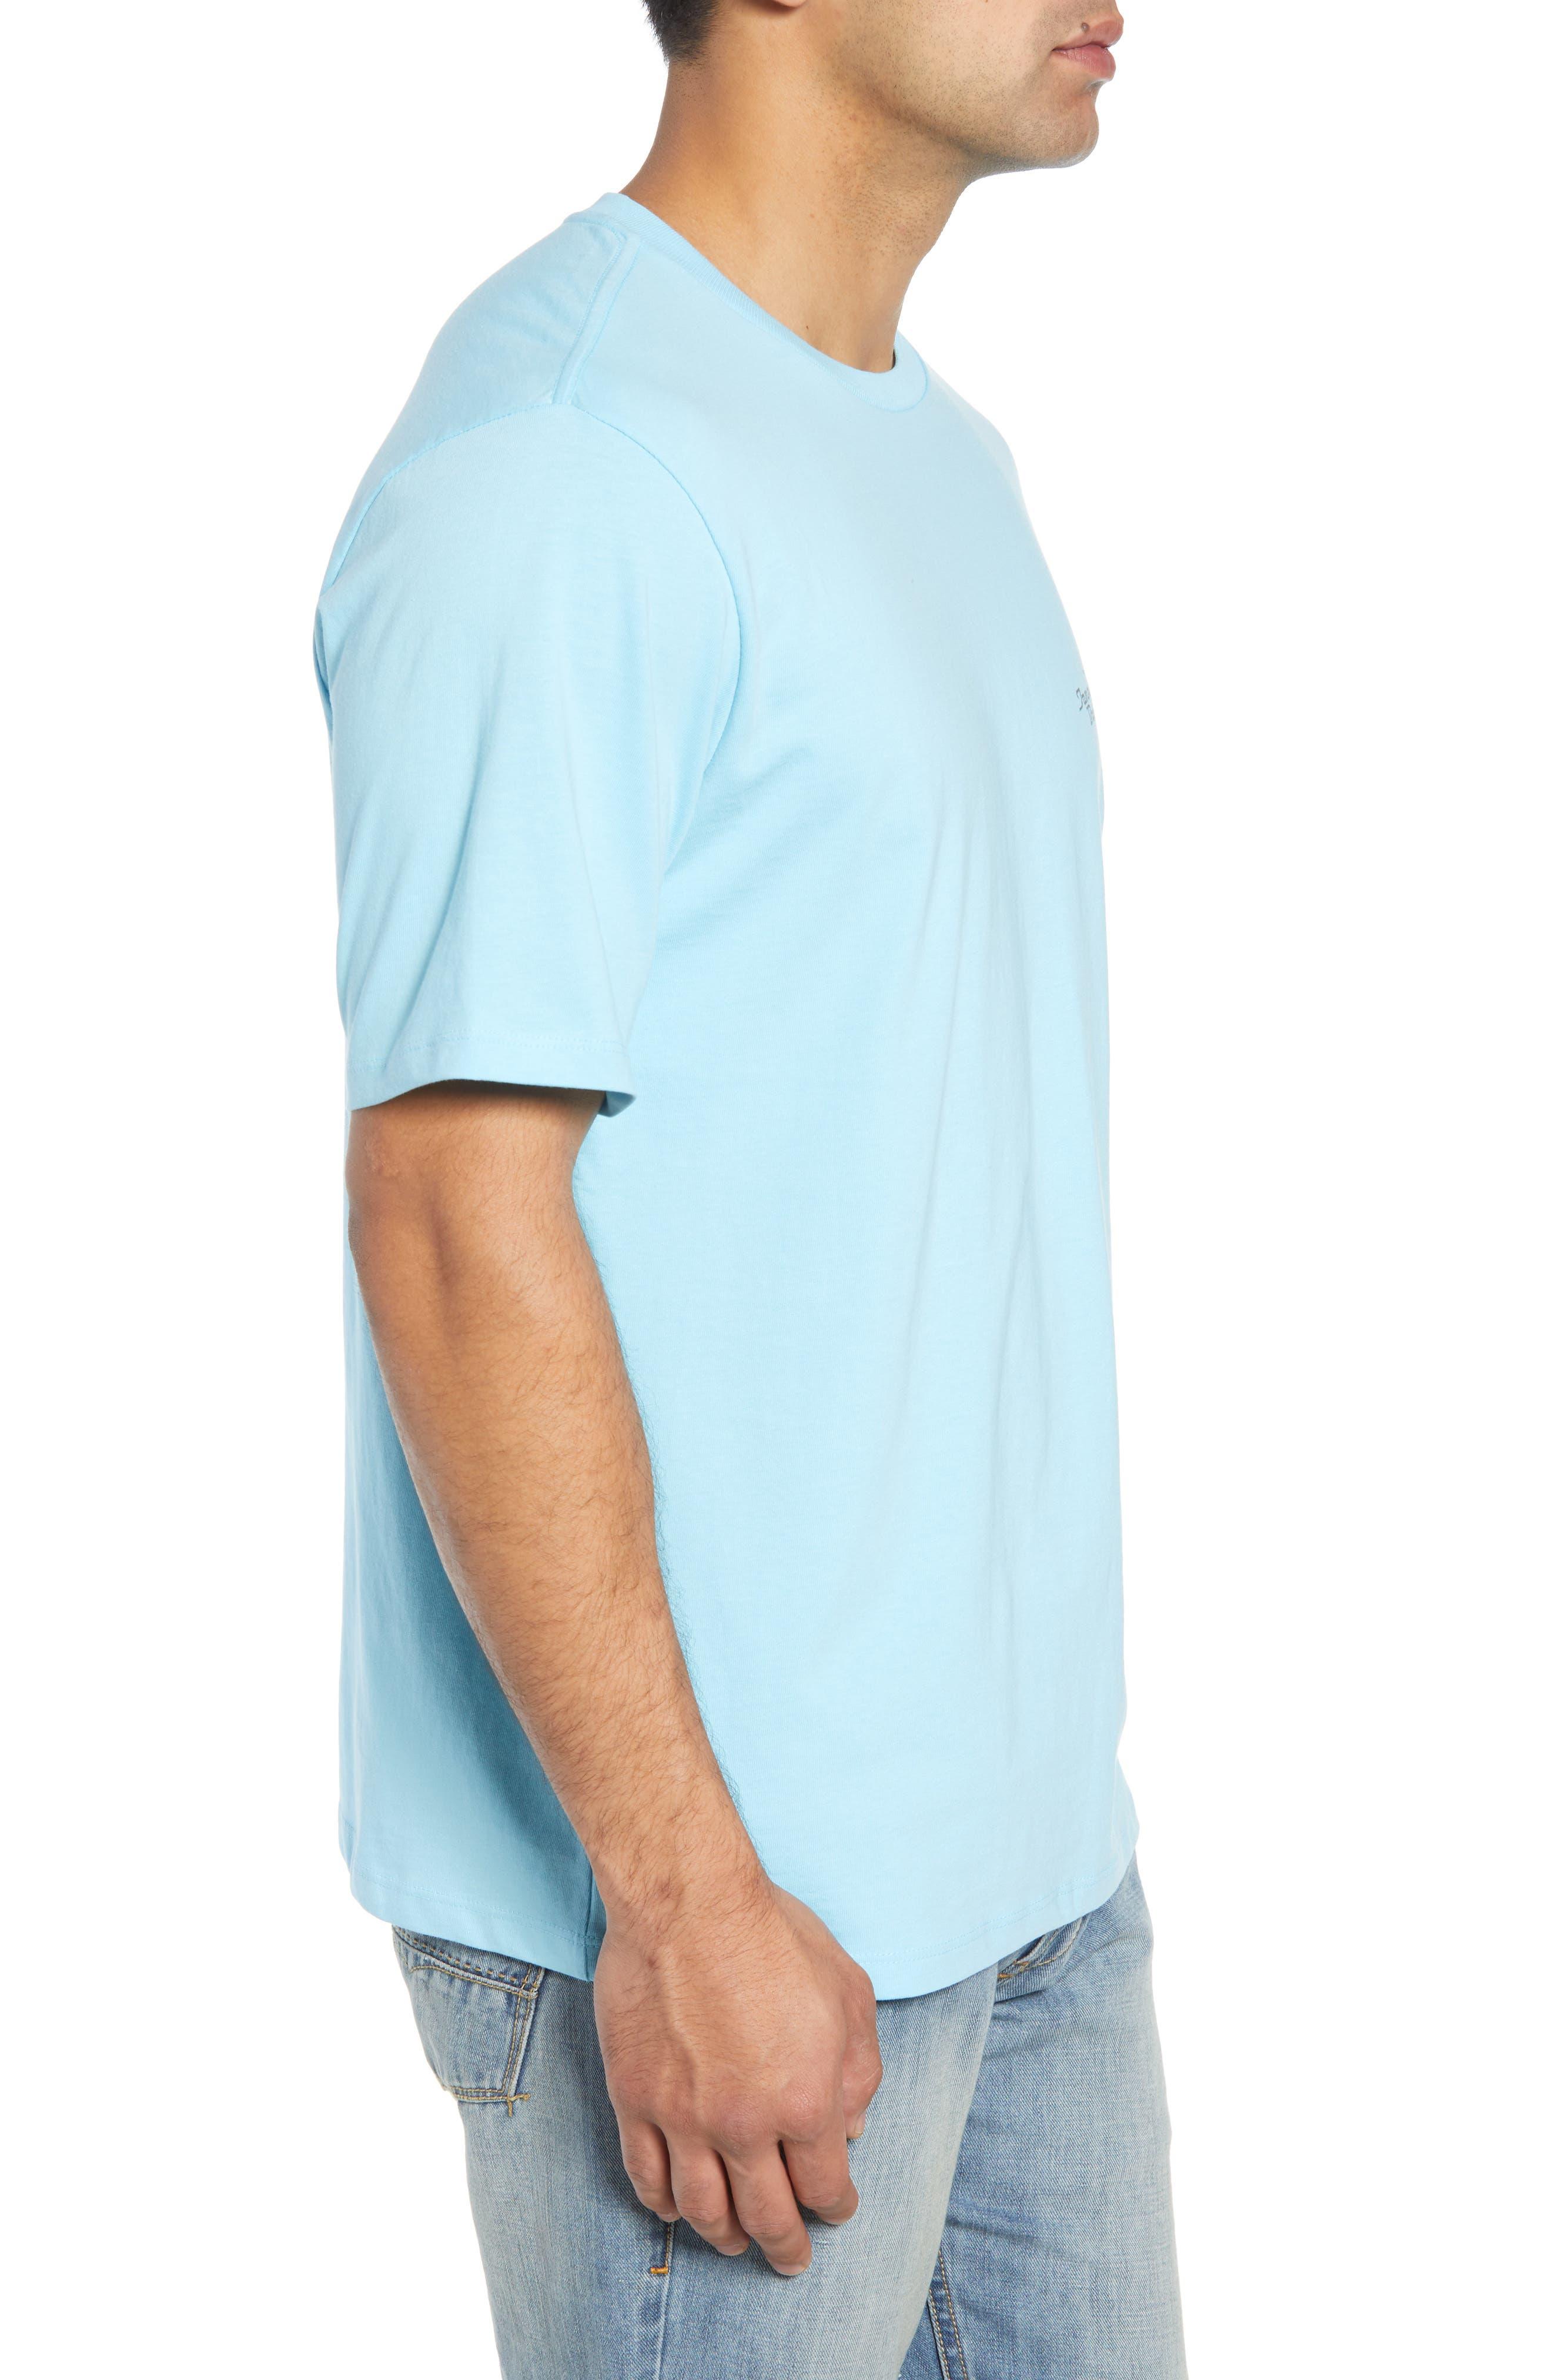 Beach Grille T-Shirt,                             Alternate thumbnail 3, color,                             400